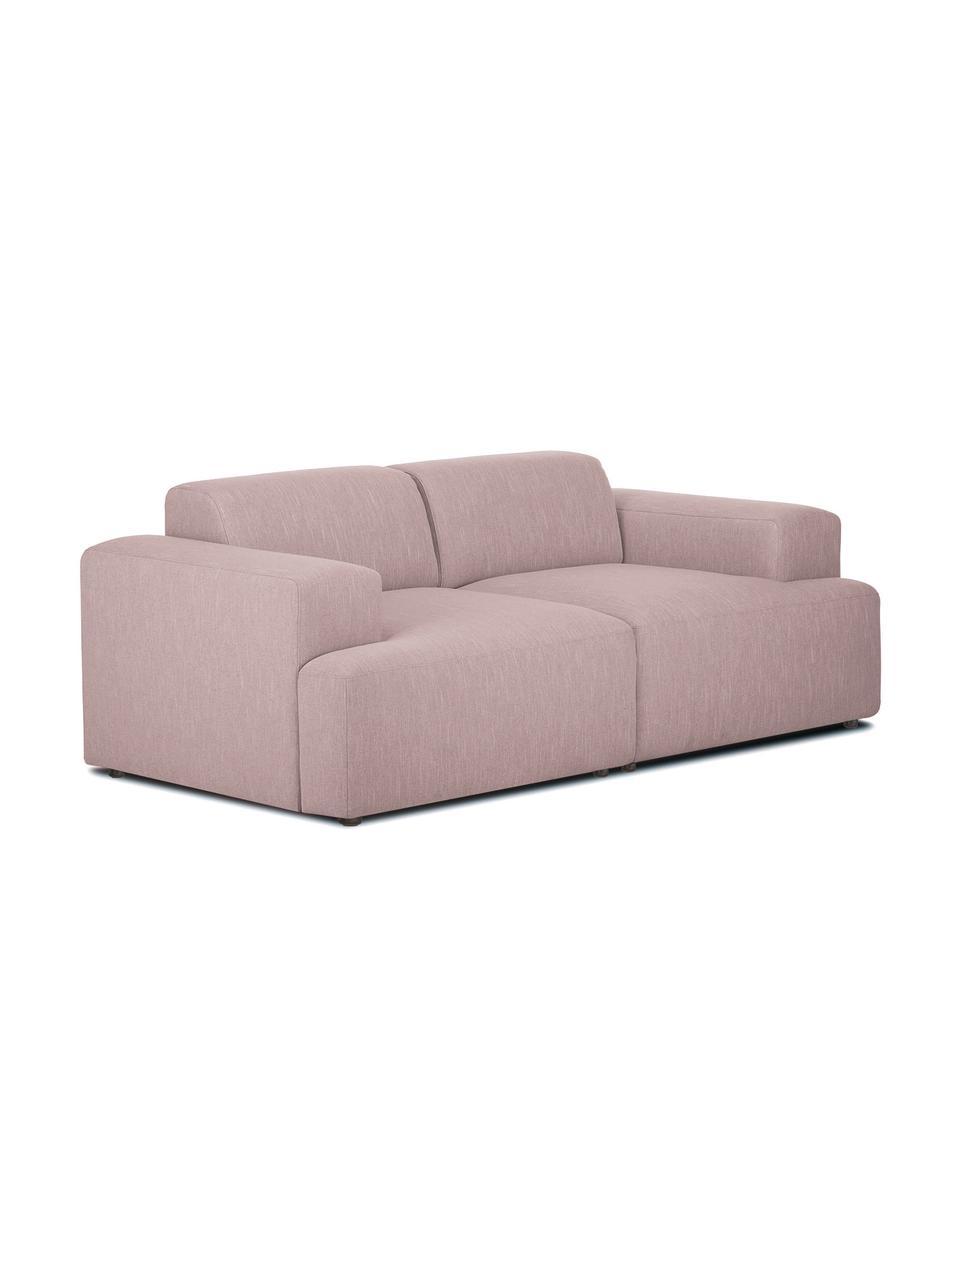 Sofa Melva (2-Sitzer) in Rosa, Bezug: 100% Polyester Der hochwe, Gestell: Massives Kiefernholz, FSC, Füße: Kunststoff, Webstoff Rosa, B 198 x T 101 cm